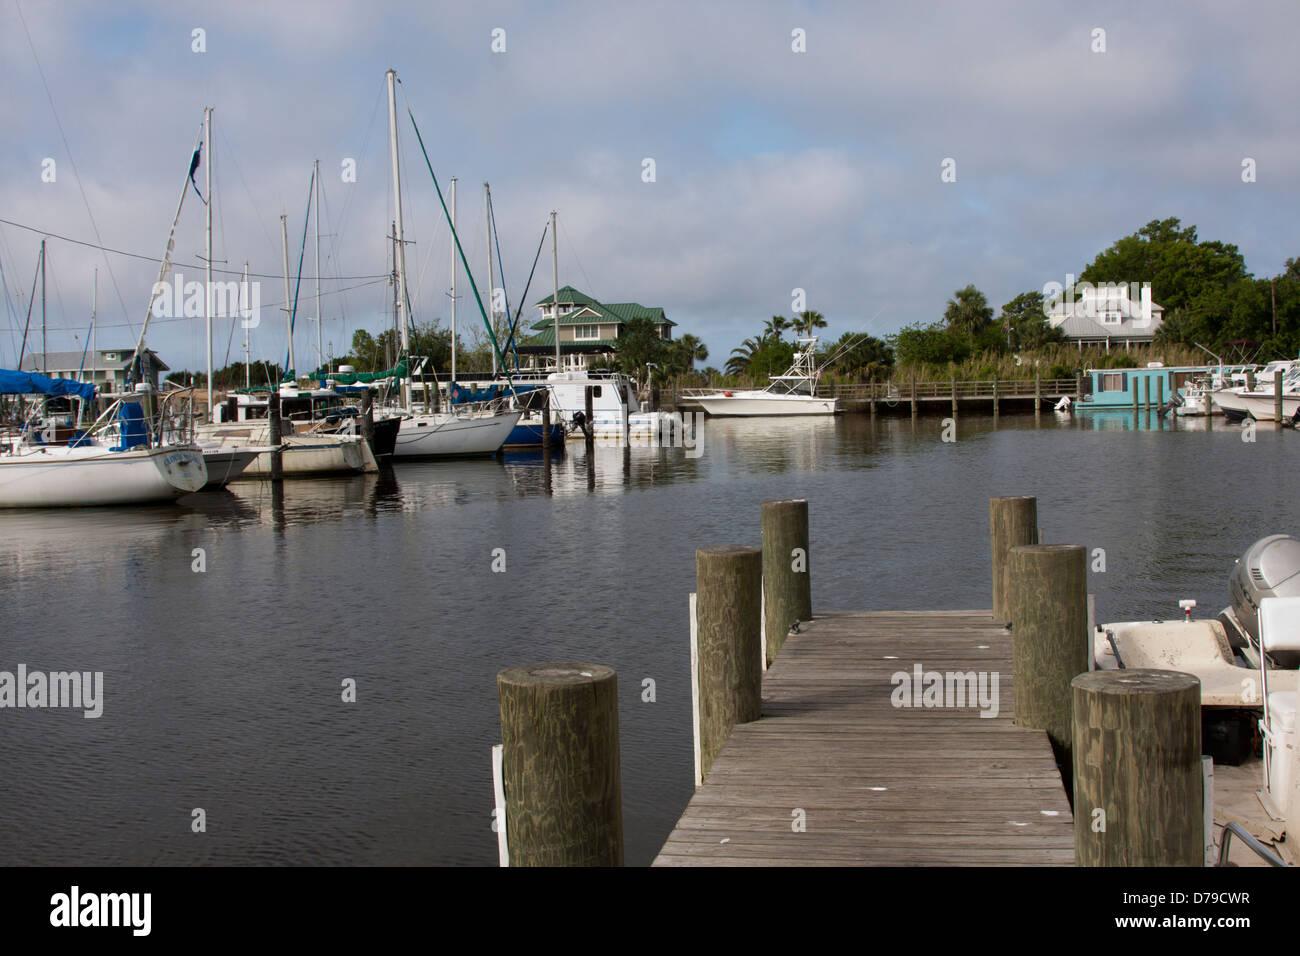 Harbor at Battery Park,  Apalachicola, FL, USA - Stock Image